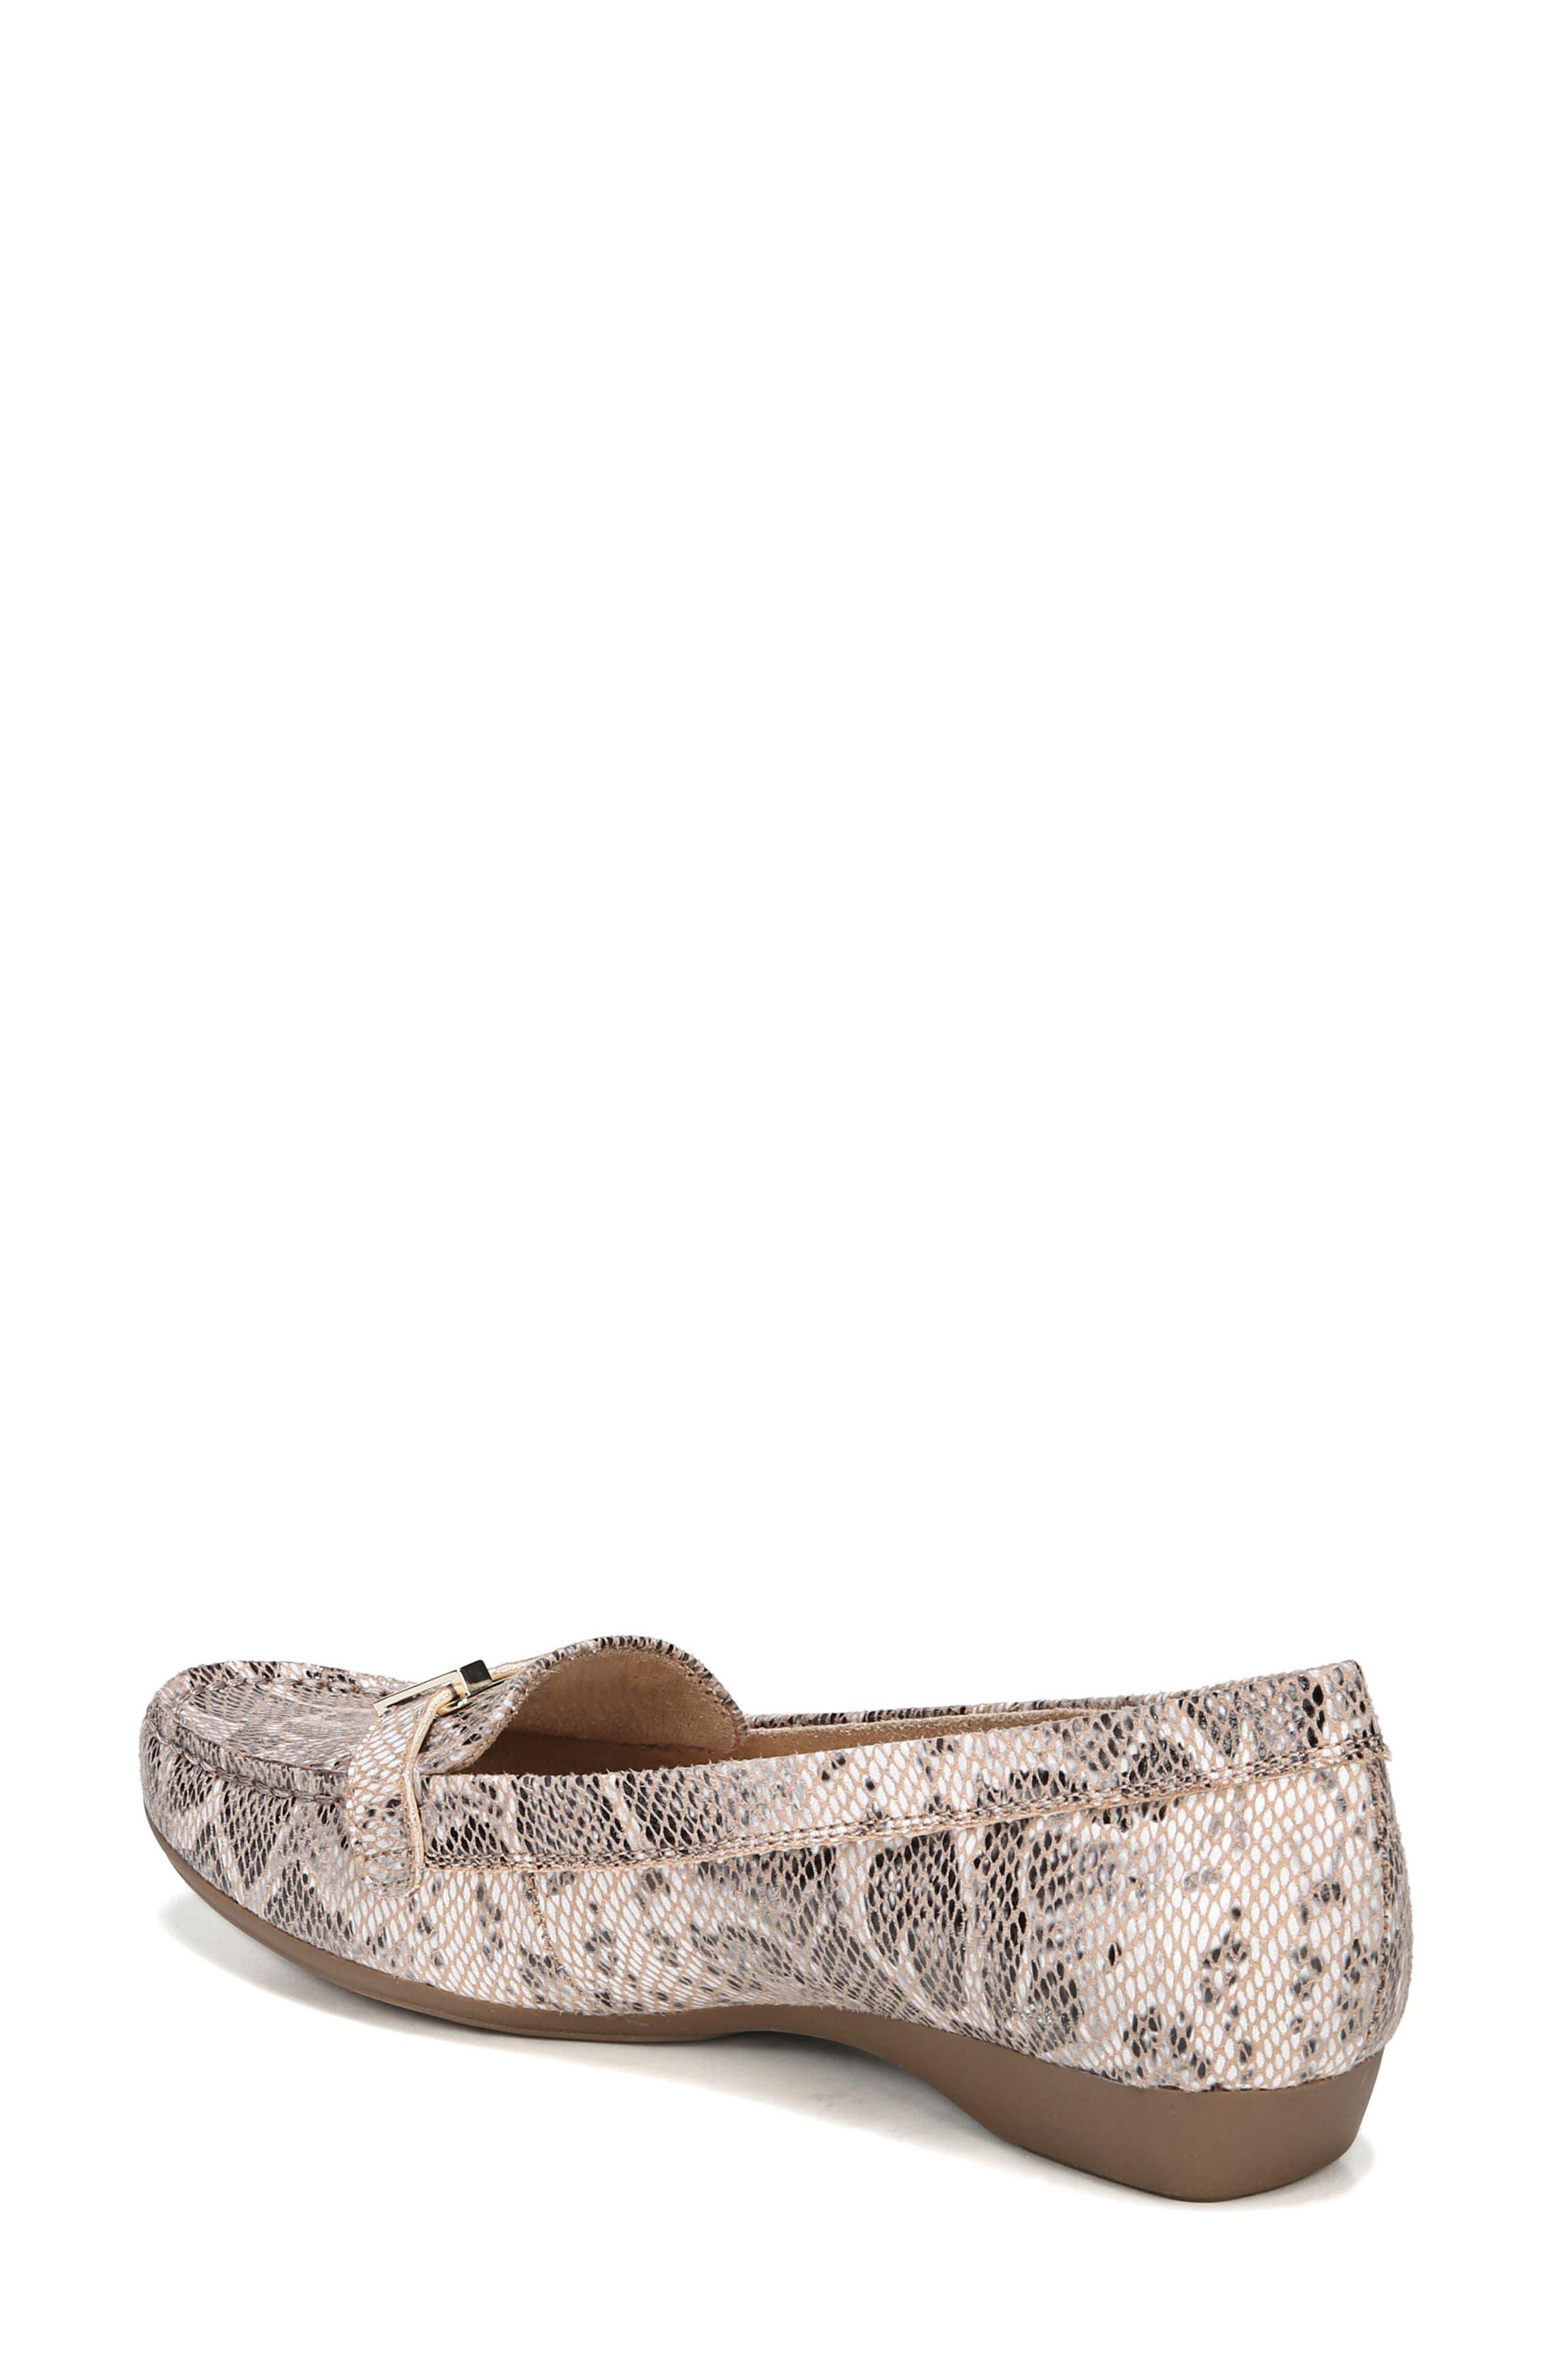 'Gisella' Loafer,                             Alternate thumbnail 2, color,                             Mauve Print Fabric